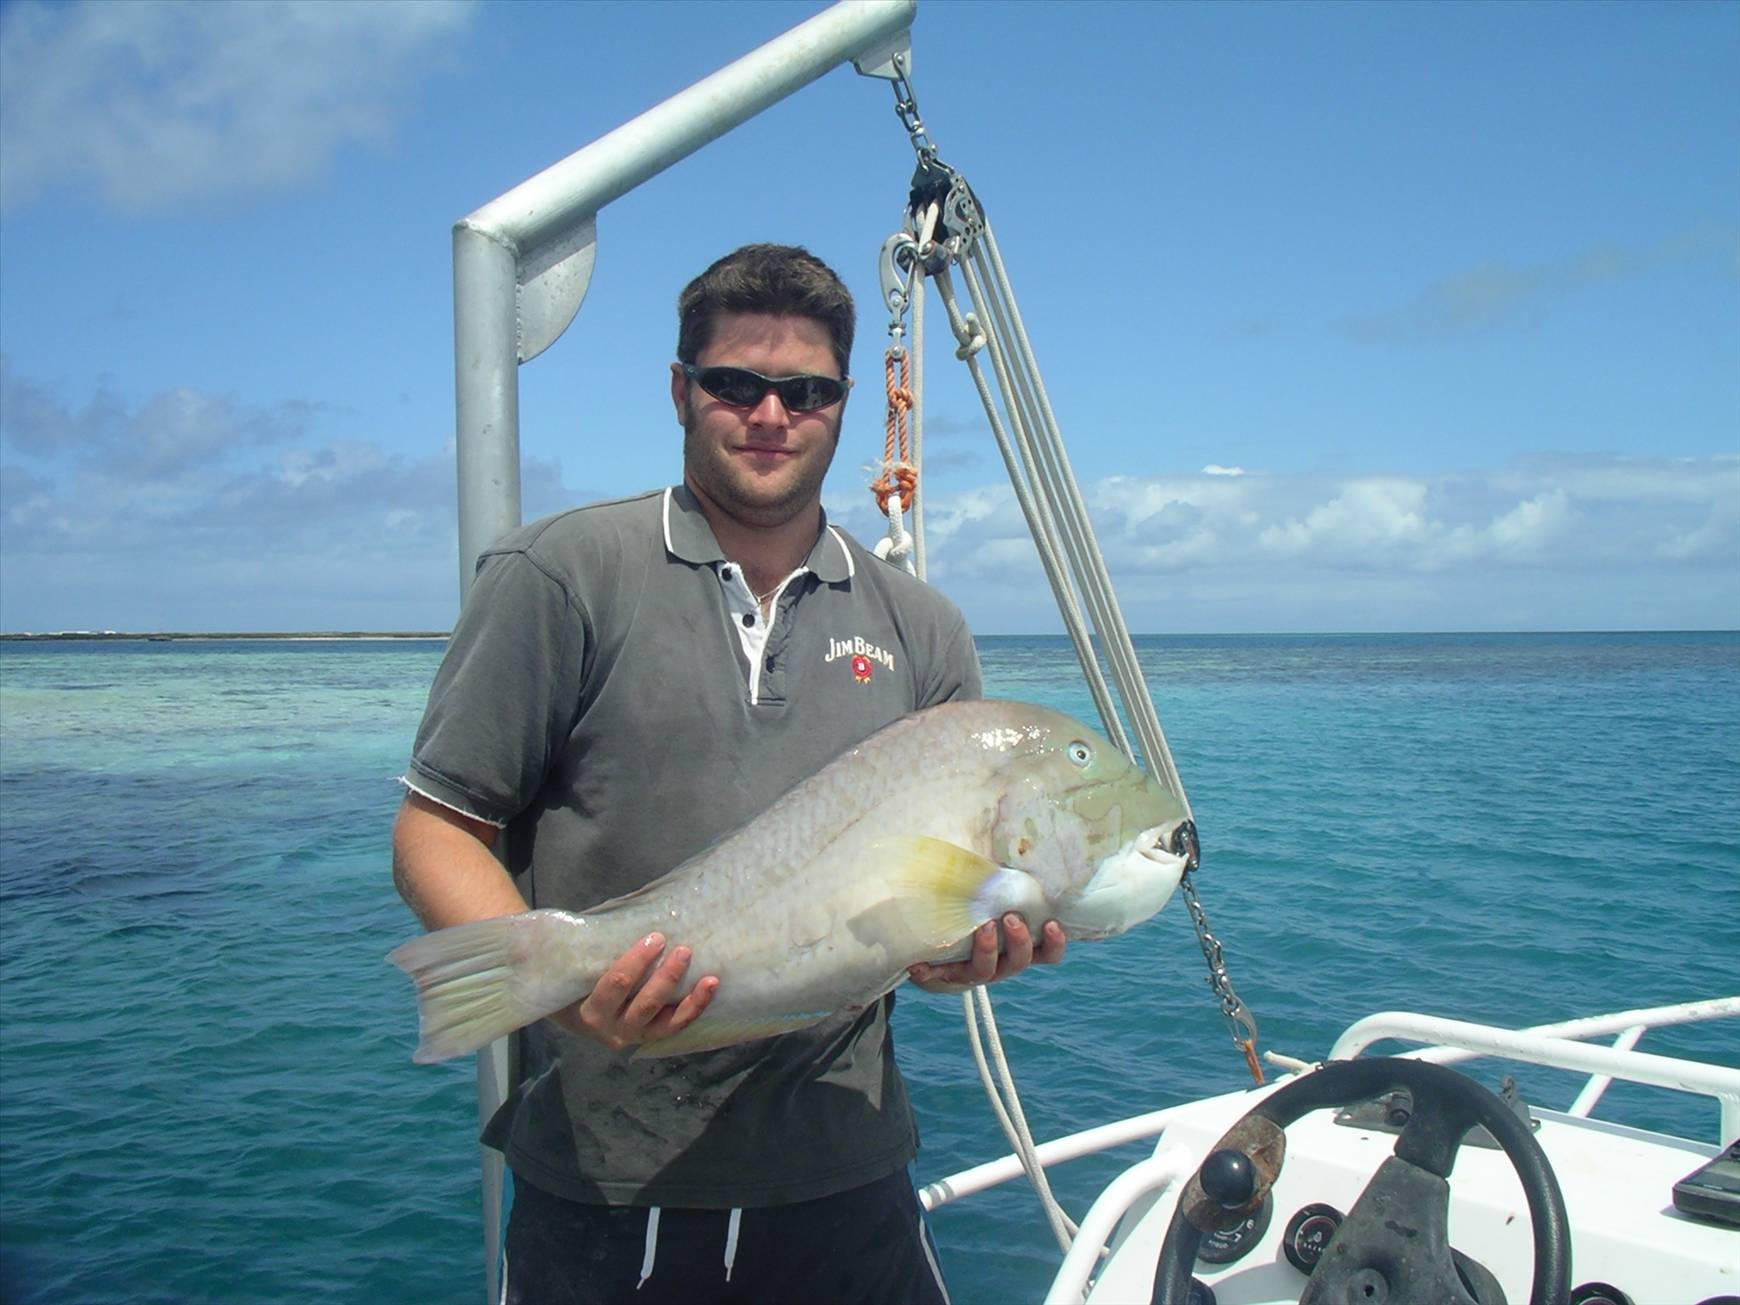 Fishing photo by captain bob photo for Capt bob fishing